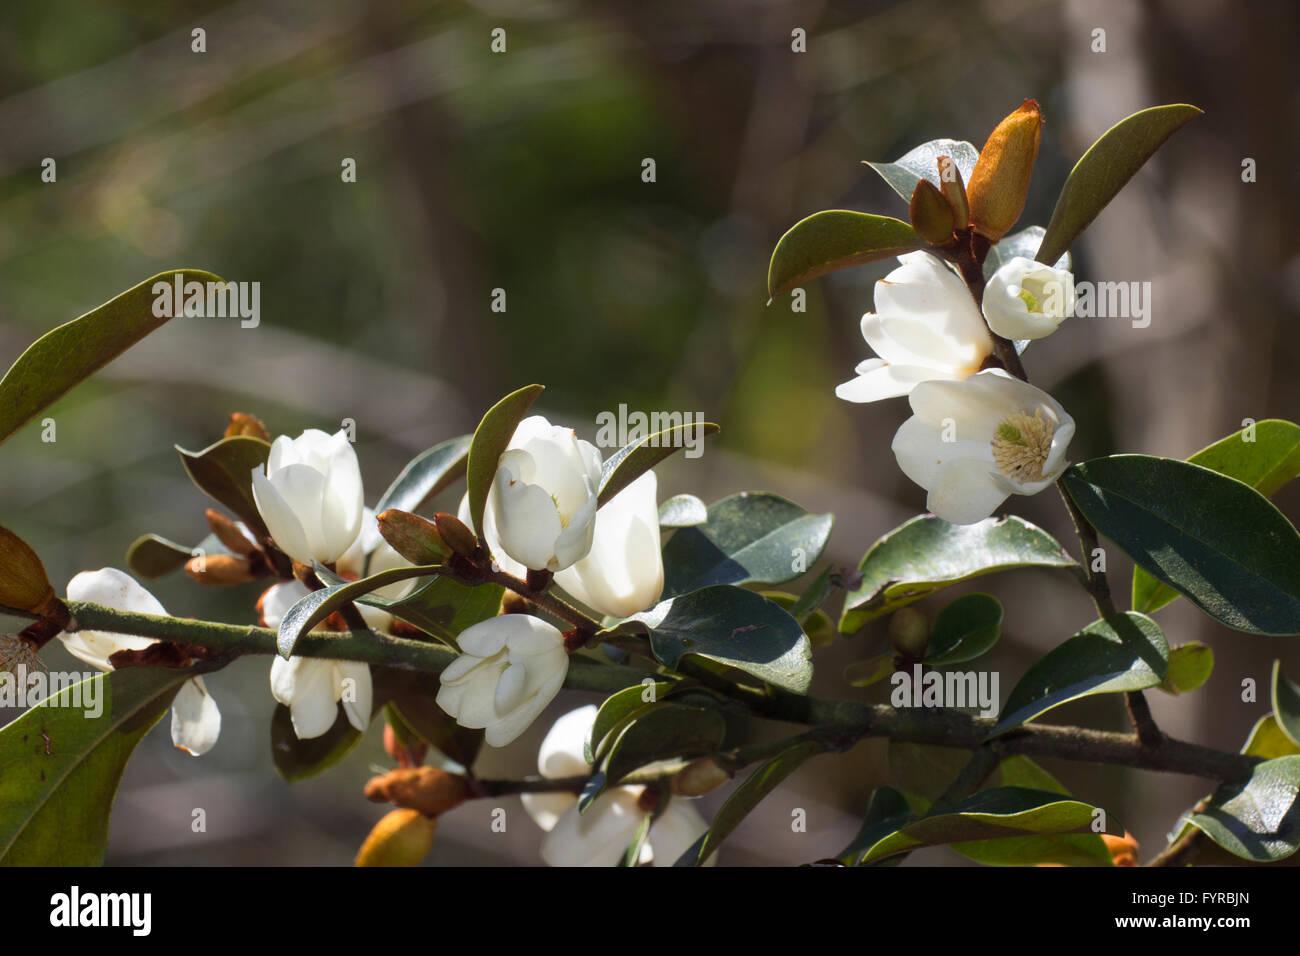 Scented White Flowers Of The Evergreen Magnolia Laevifolia Michelia